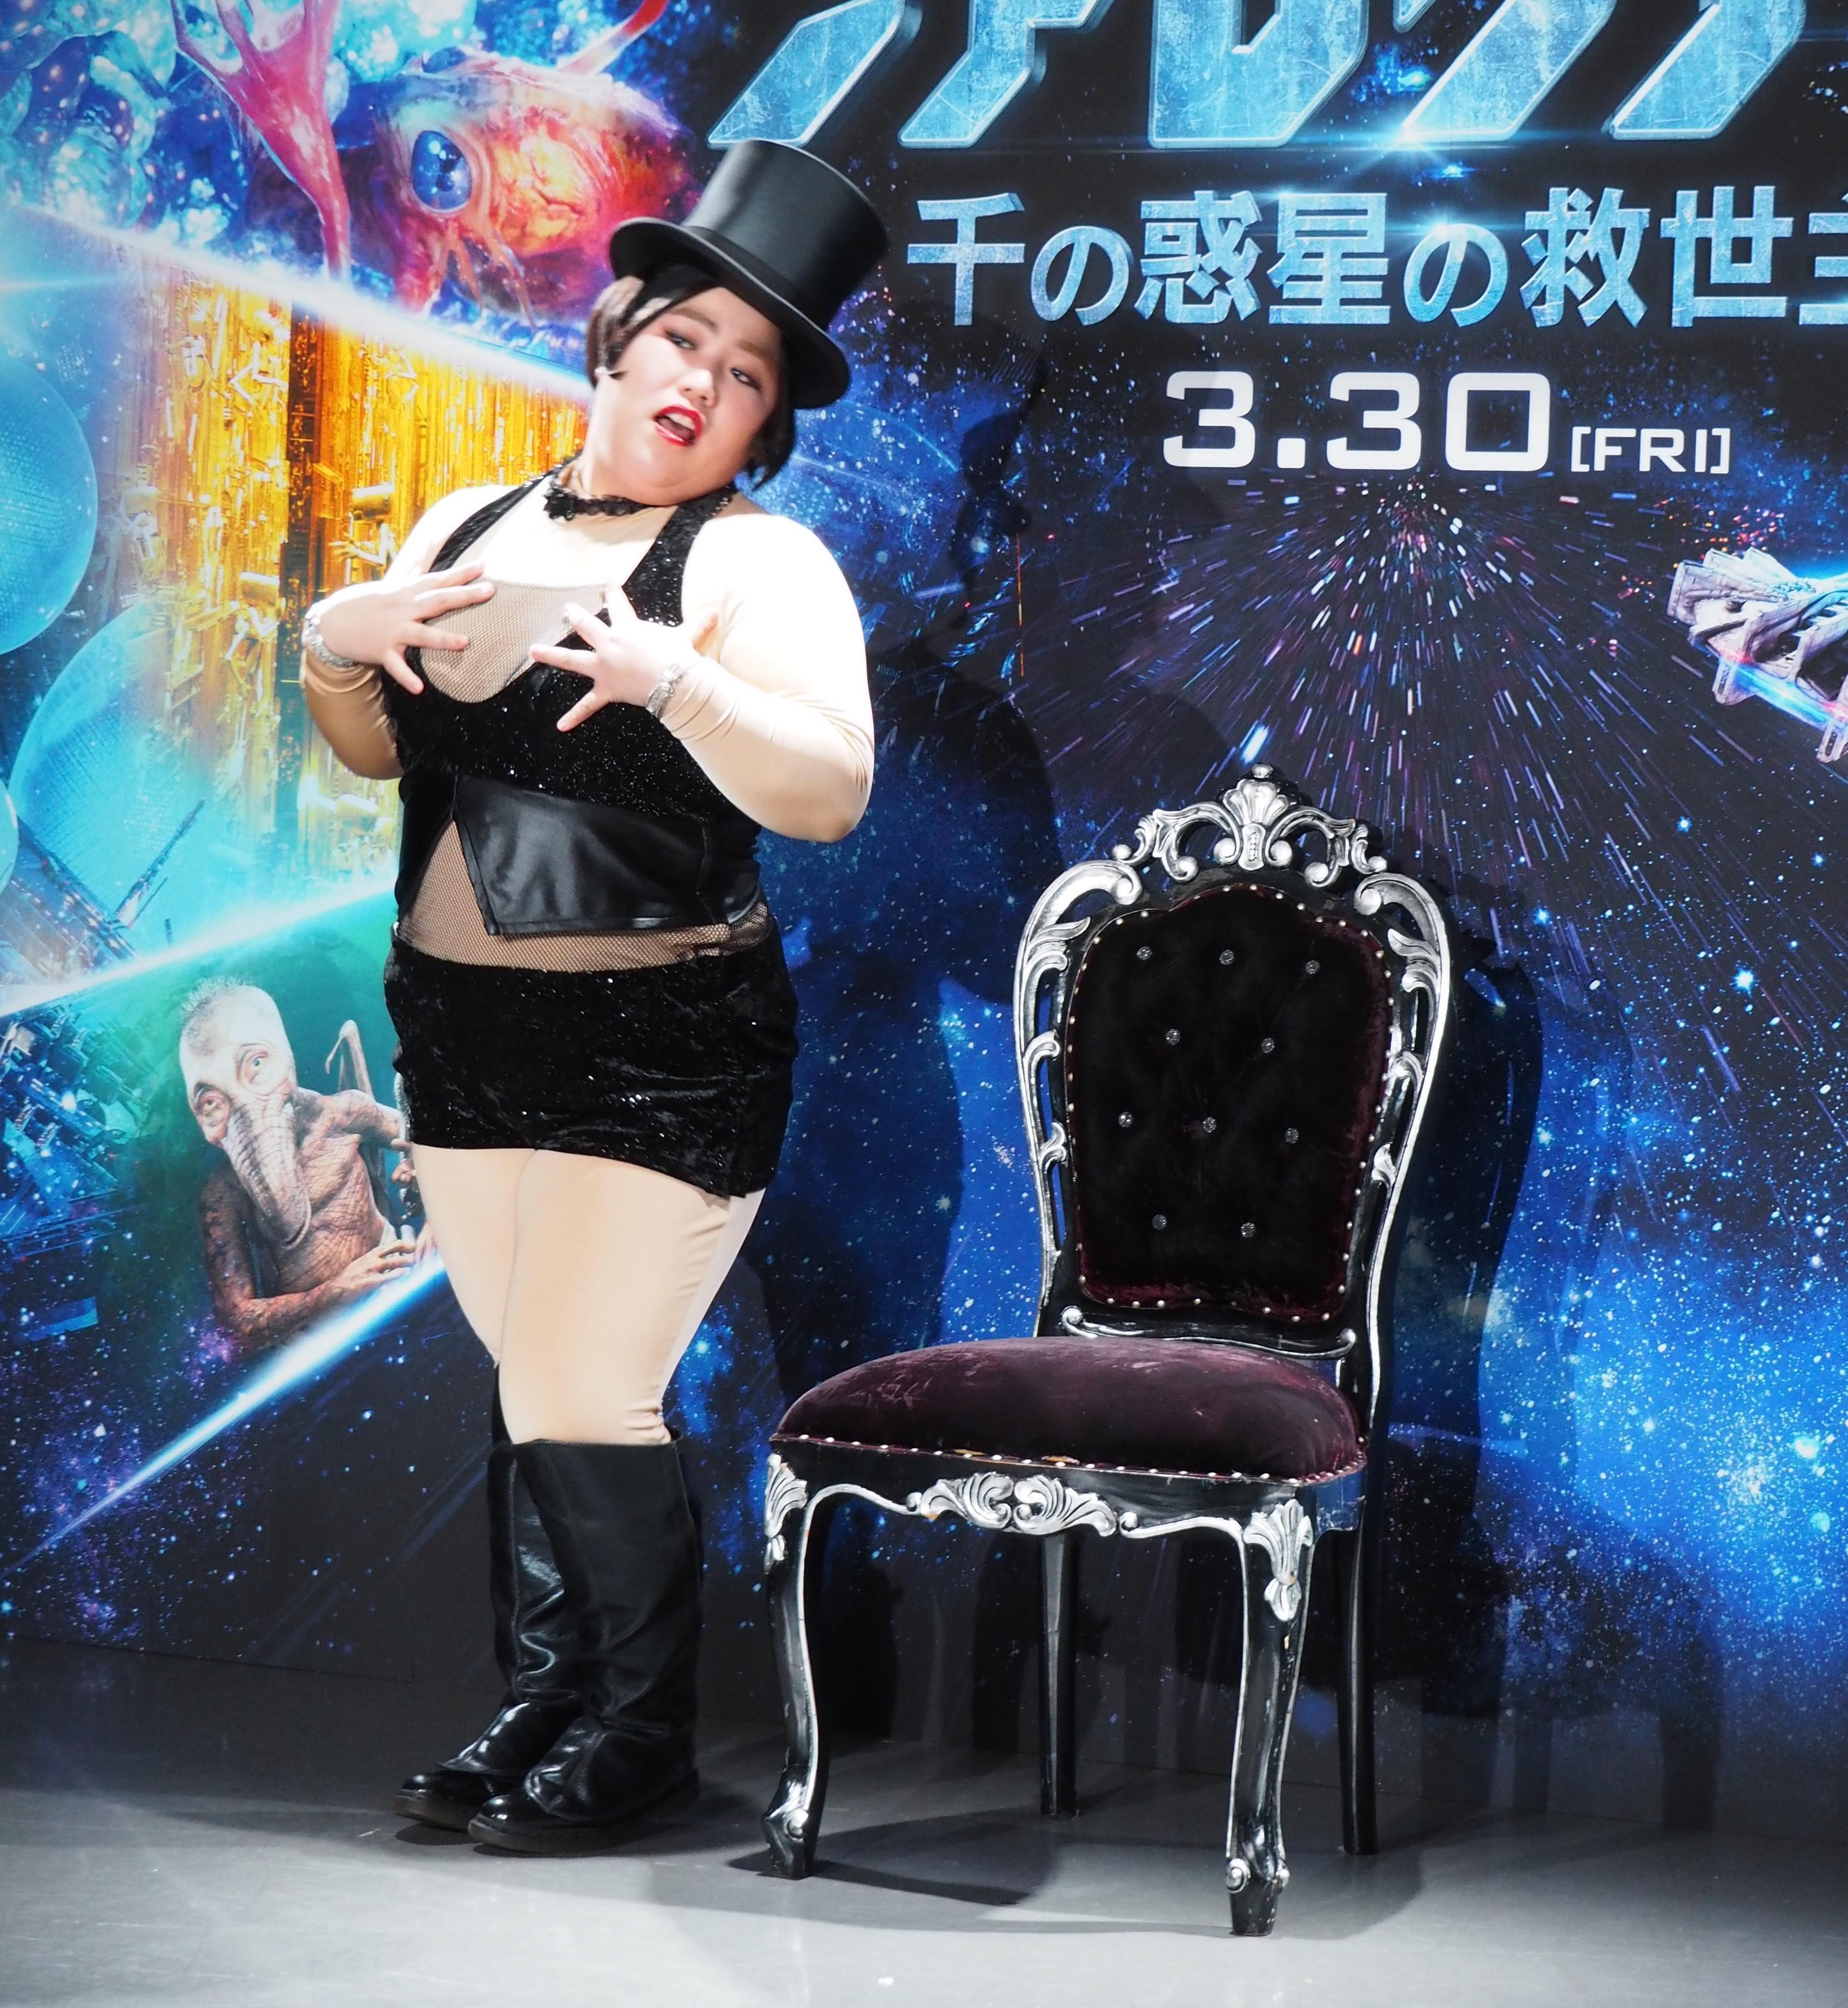 http://news.yoshimoto.co.jp/20180129190903-b918fa66c482912dd769a3074ffefb819943accd.jpg